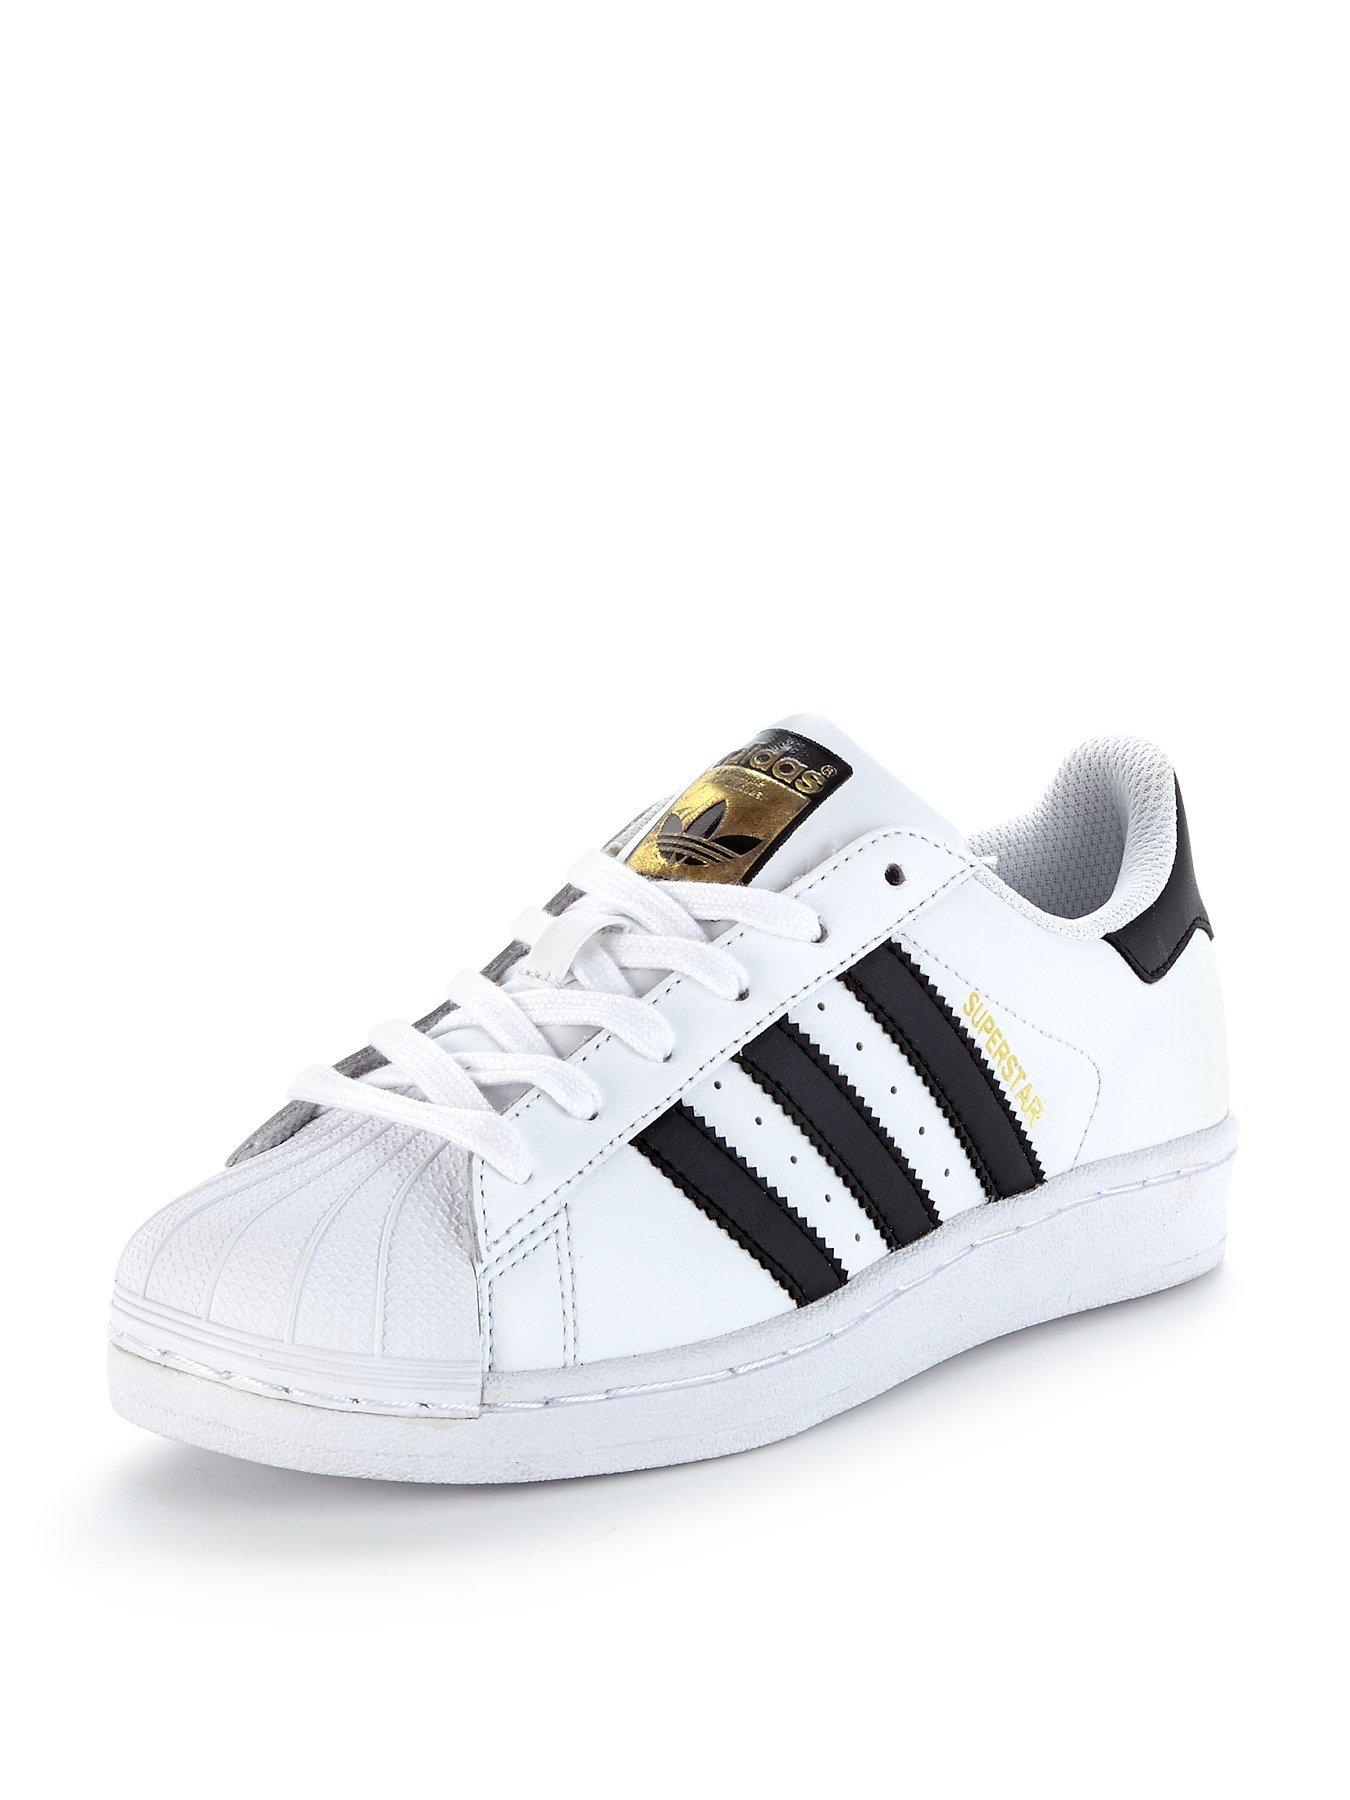 junior adidas superstars black and white